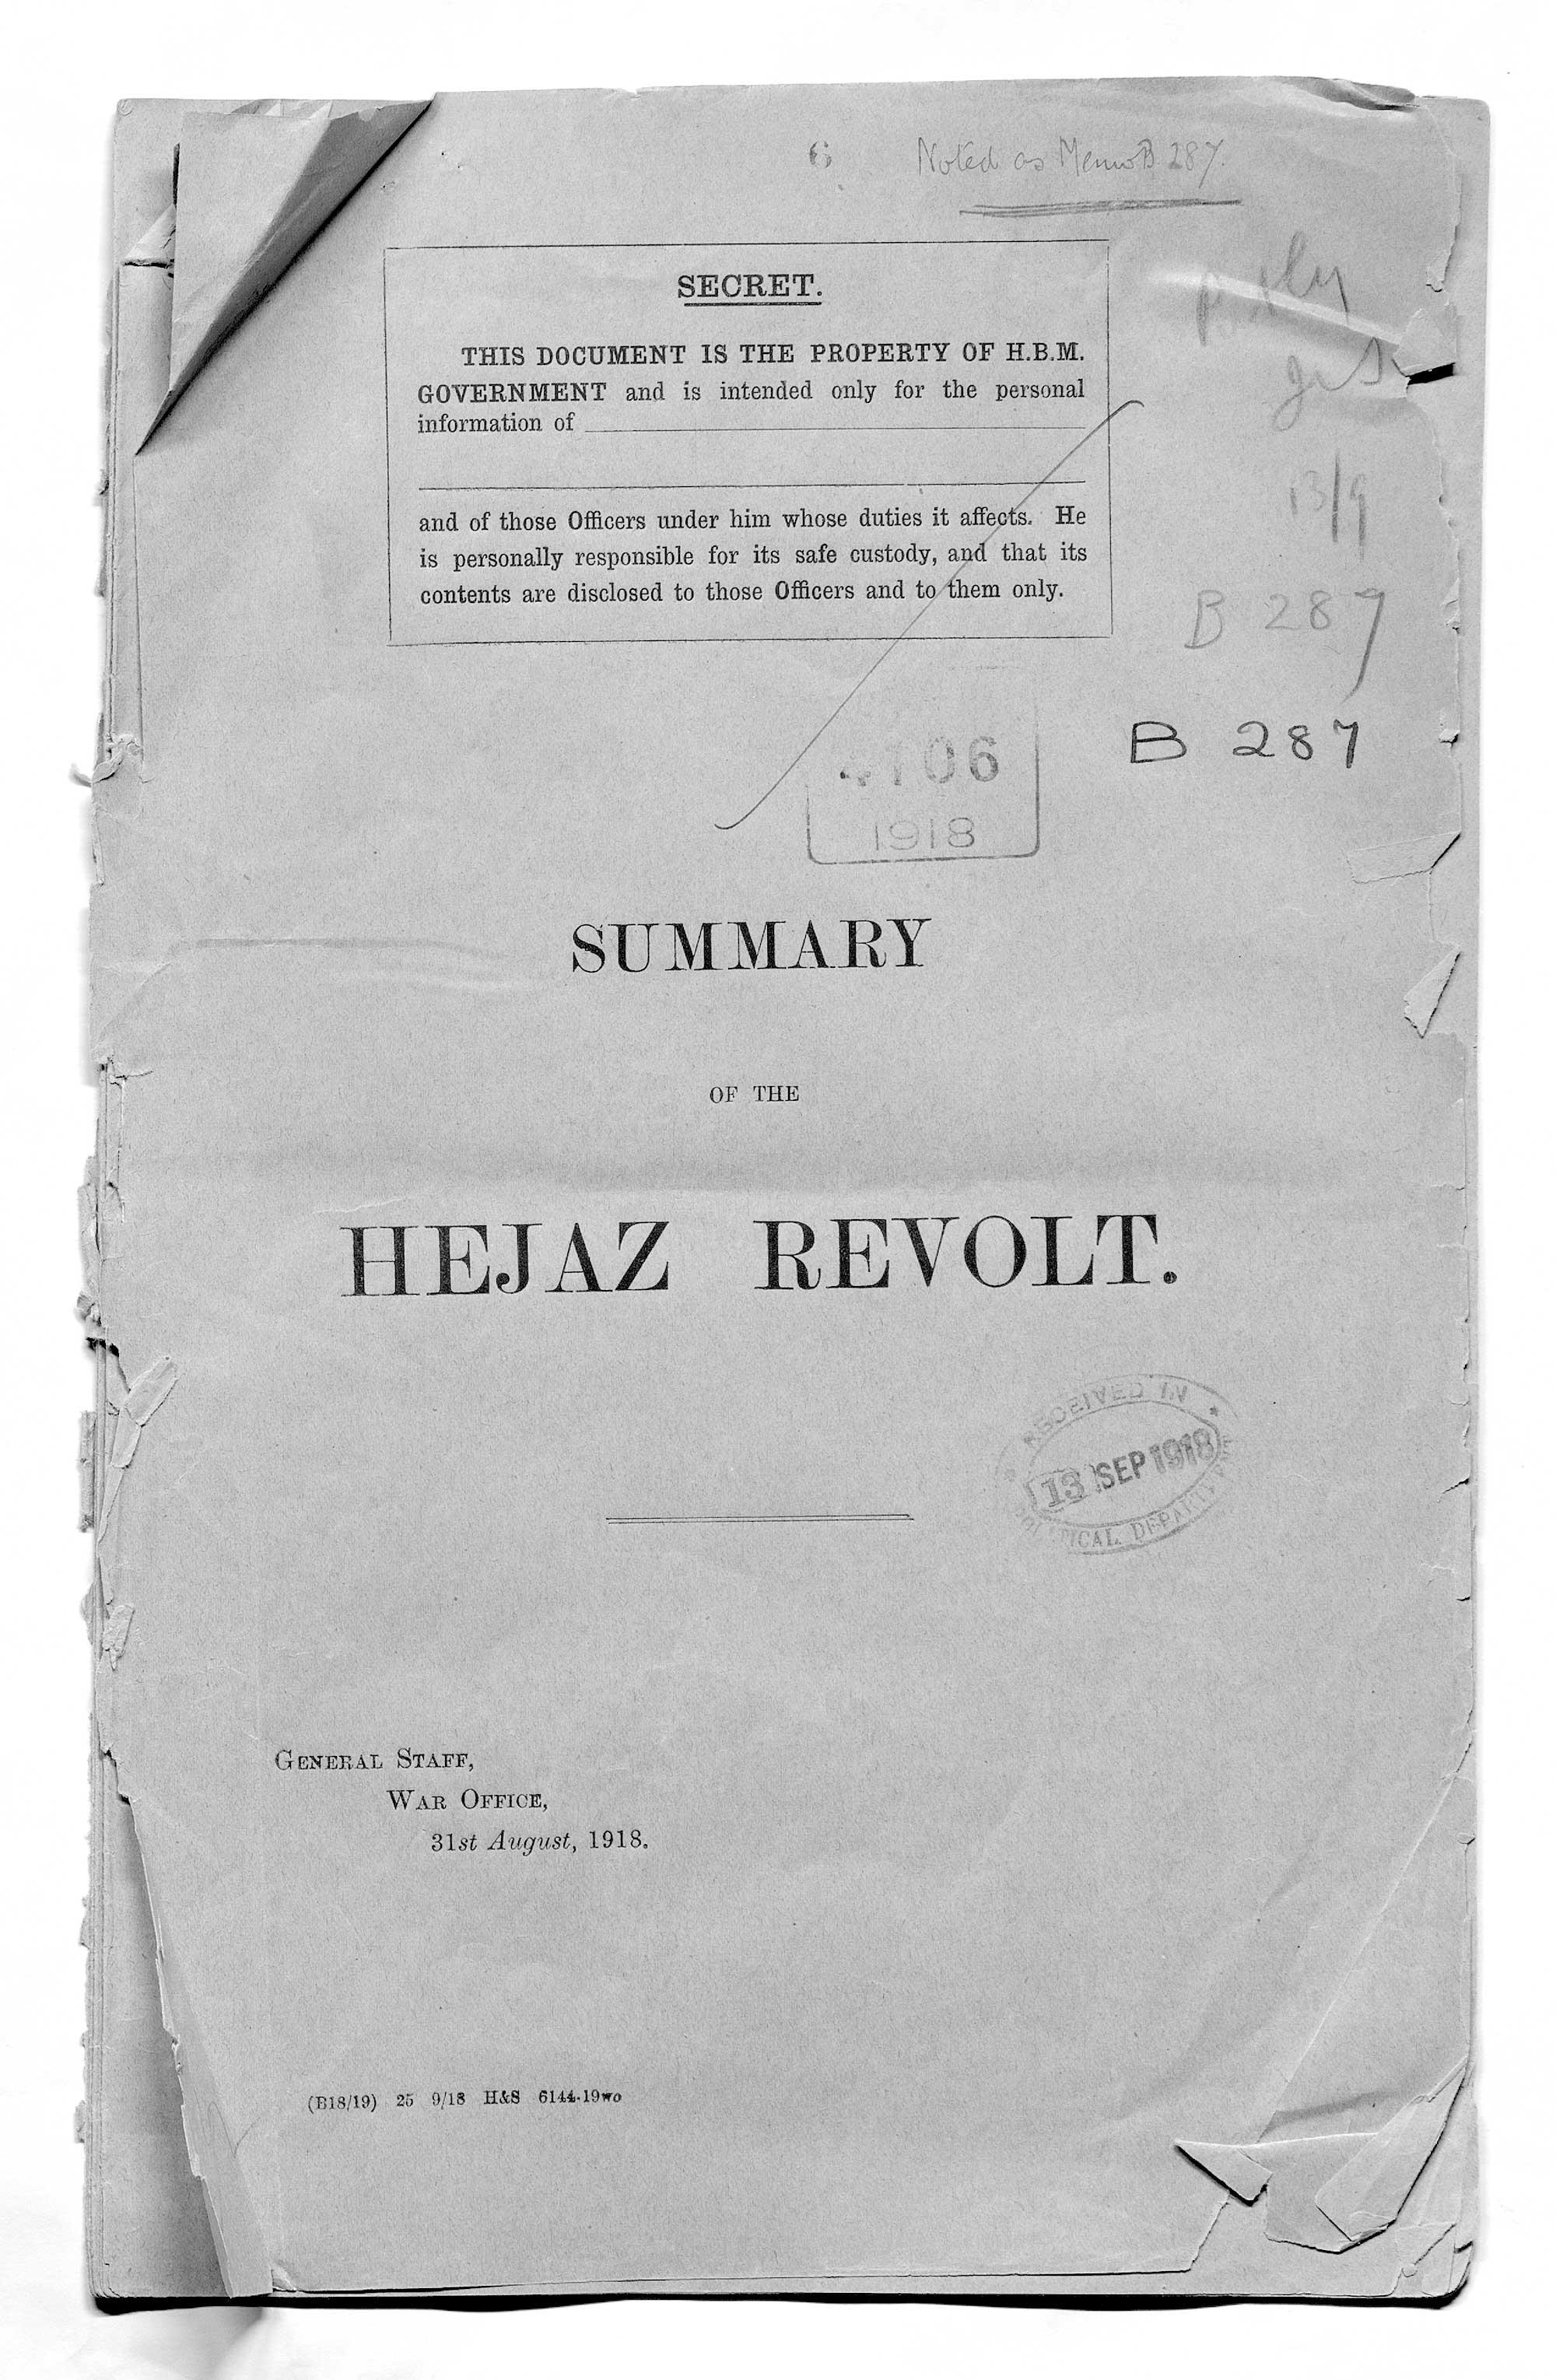 Summary of the Hejaz Revolt General Staff, War Office, 31 August 1918